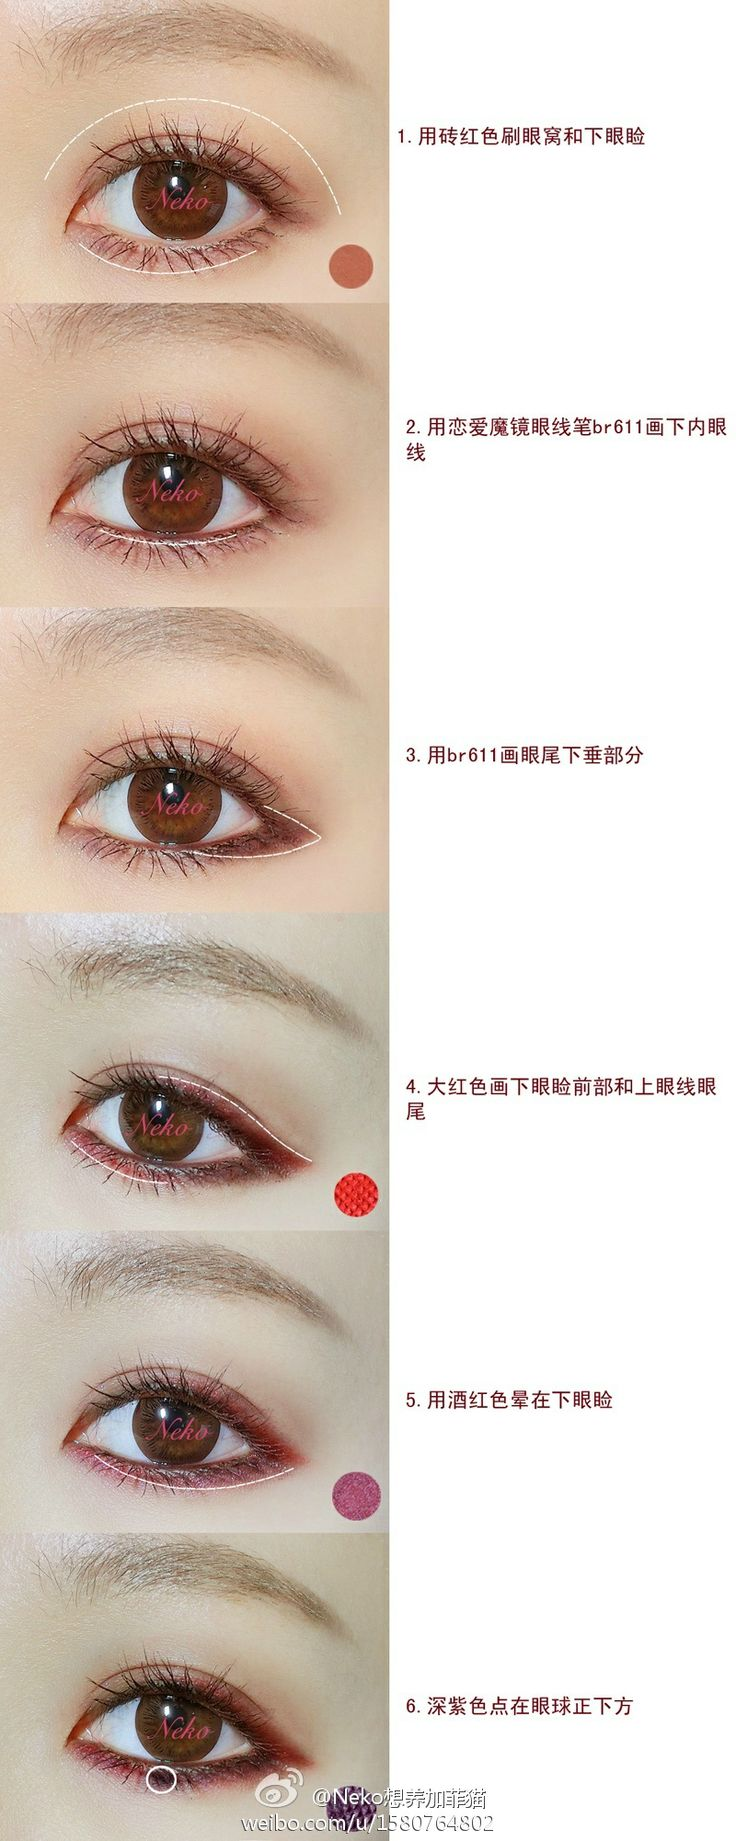 Baekhyun's eye make up tutorial ⭐️⭐️ www.AsianSkincare.Rocks